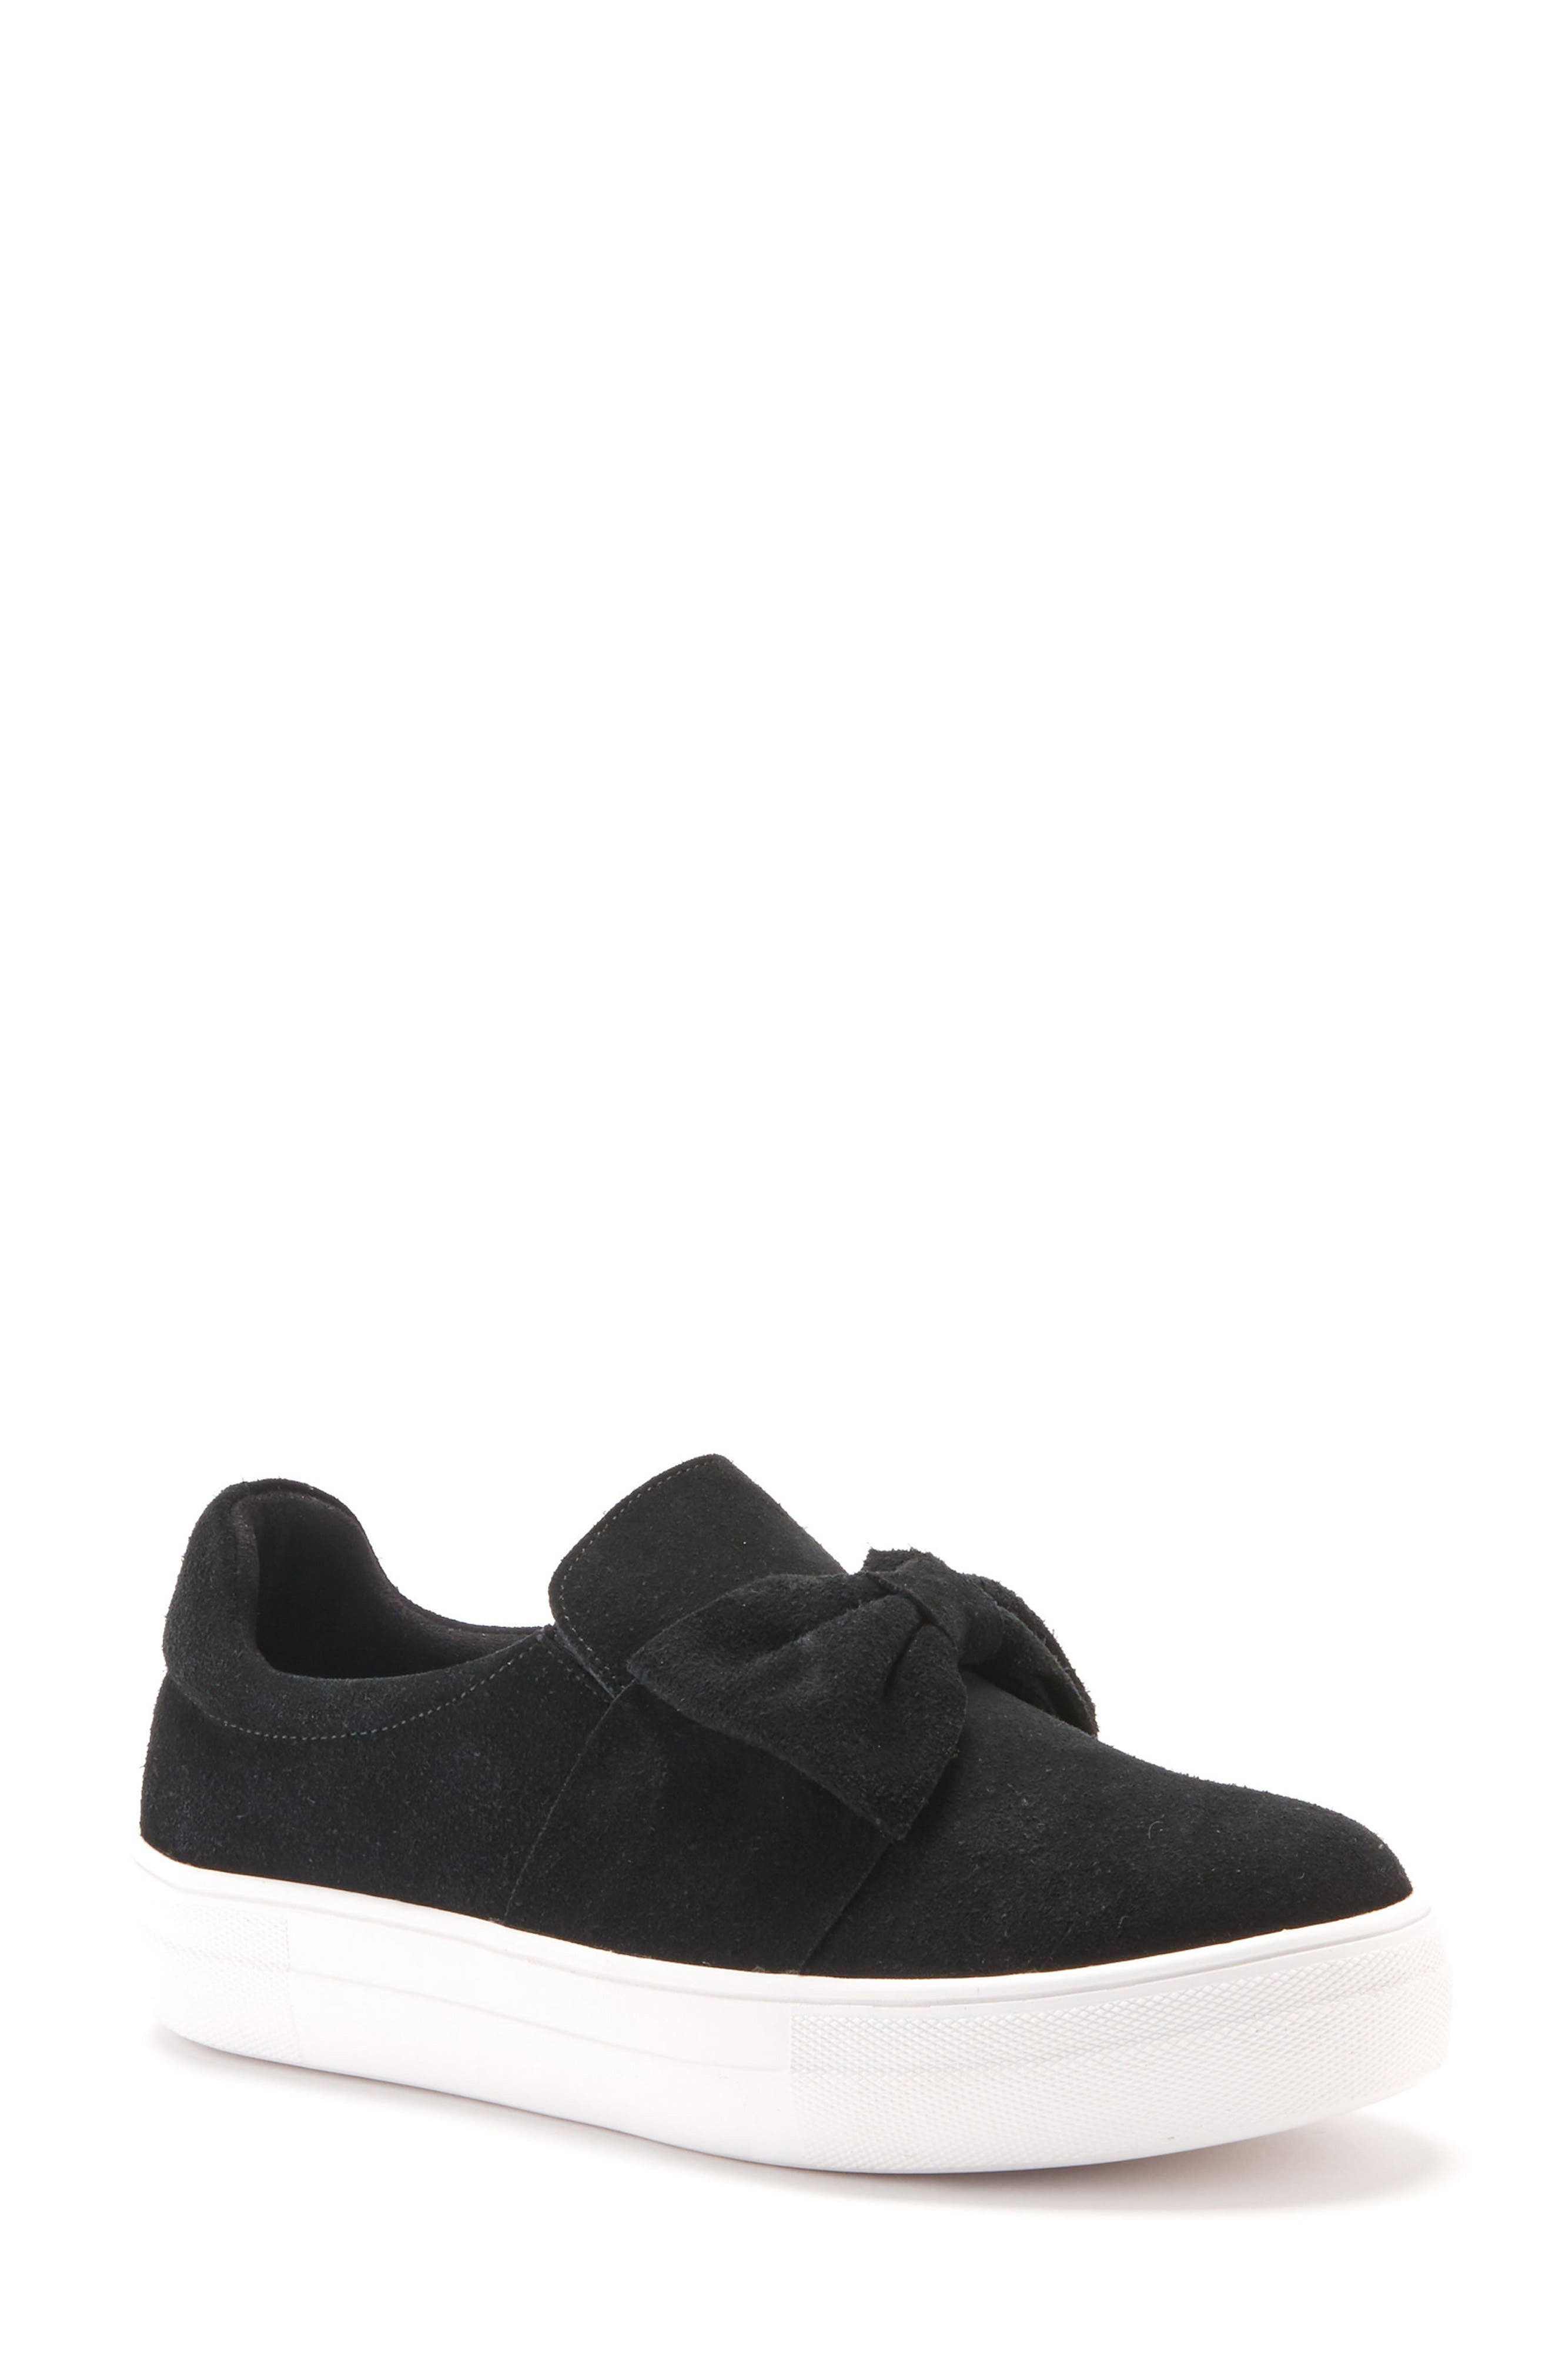 Gigi Sneaker,                             Main thumbnail 1, color,                             Black Suede